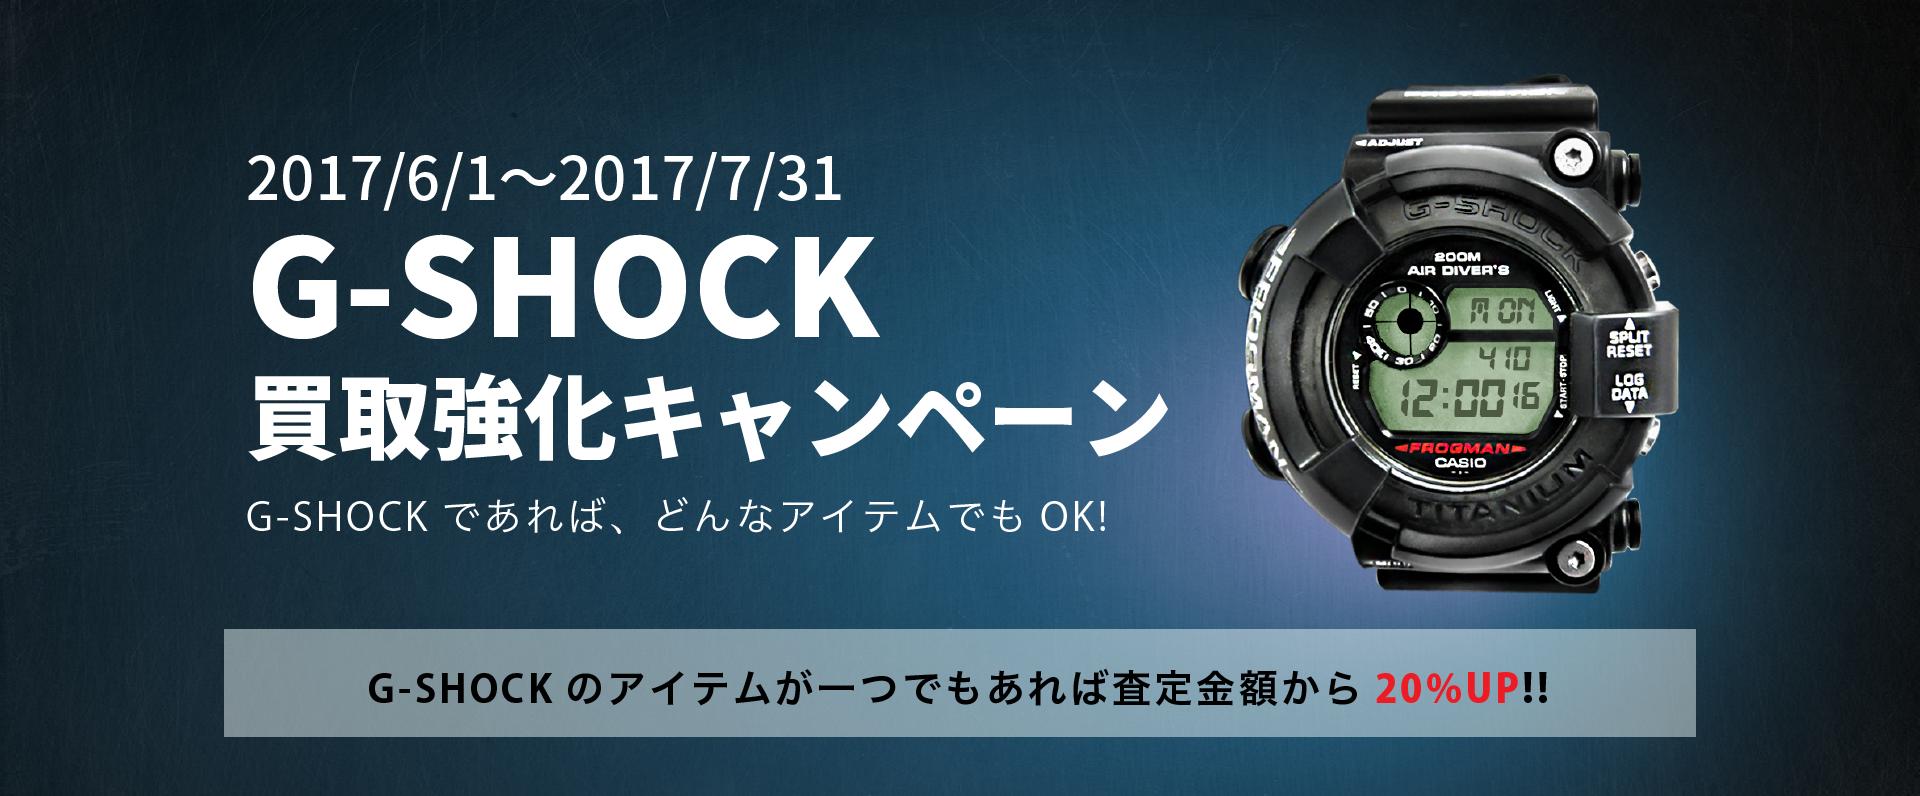 G-SHOCKキャンペーンのキービジュアル